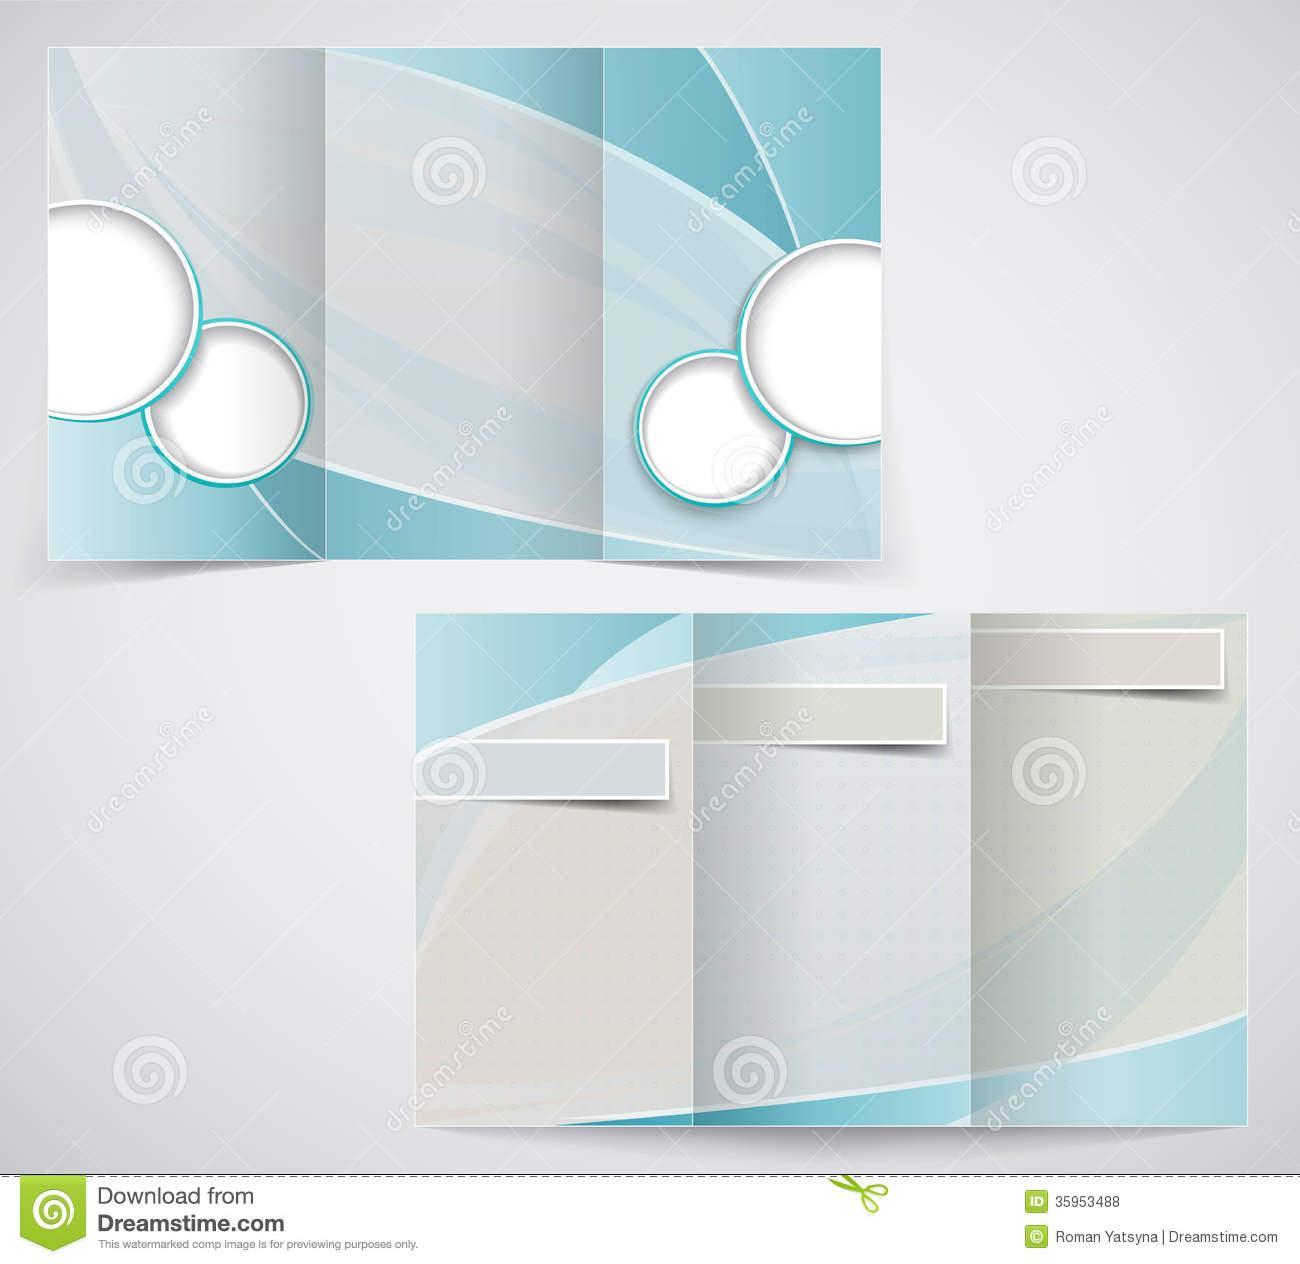 A3 Brochure Template Psd Free